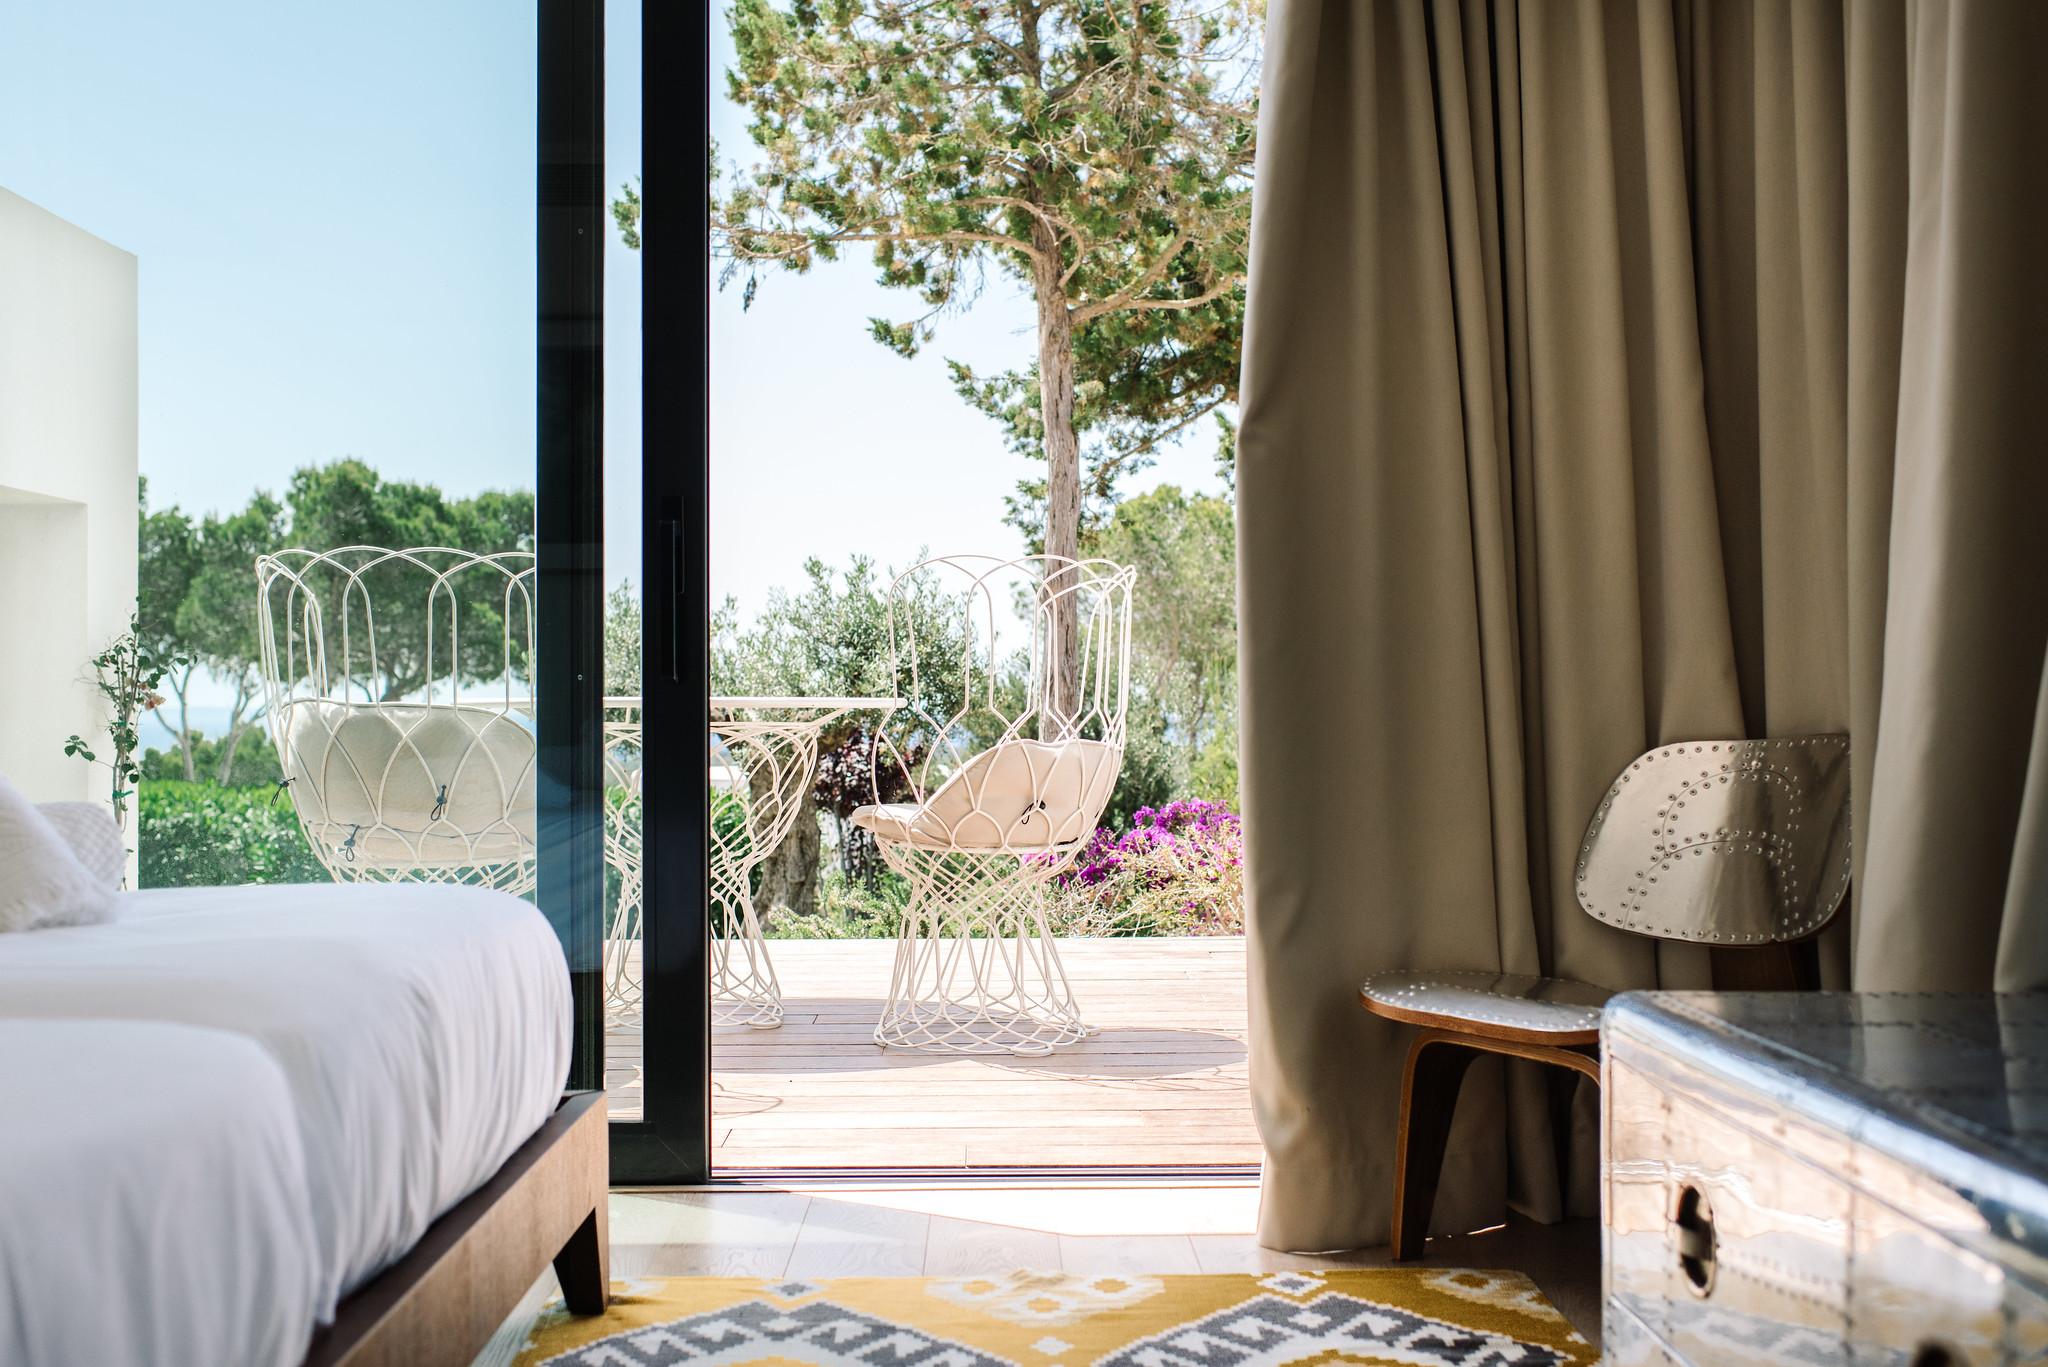 https://www.white-ibiza.com/wp-content/uploads/2020/06/white-ibiza-villas-can-jondal-interior-bedroom3-1.jpg